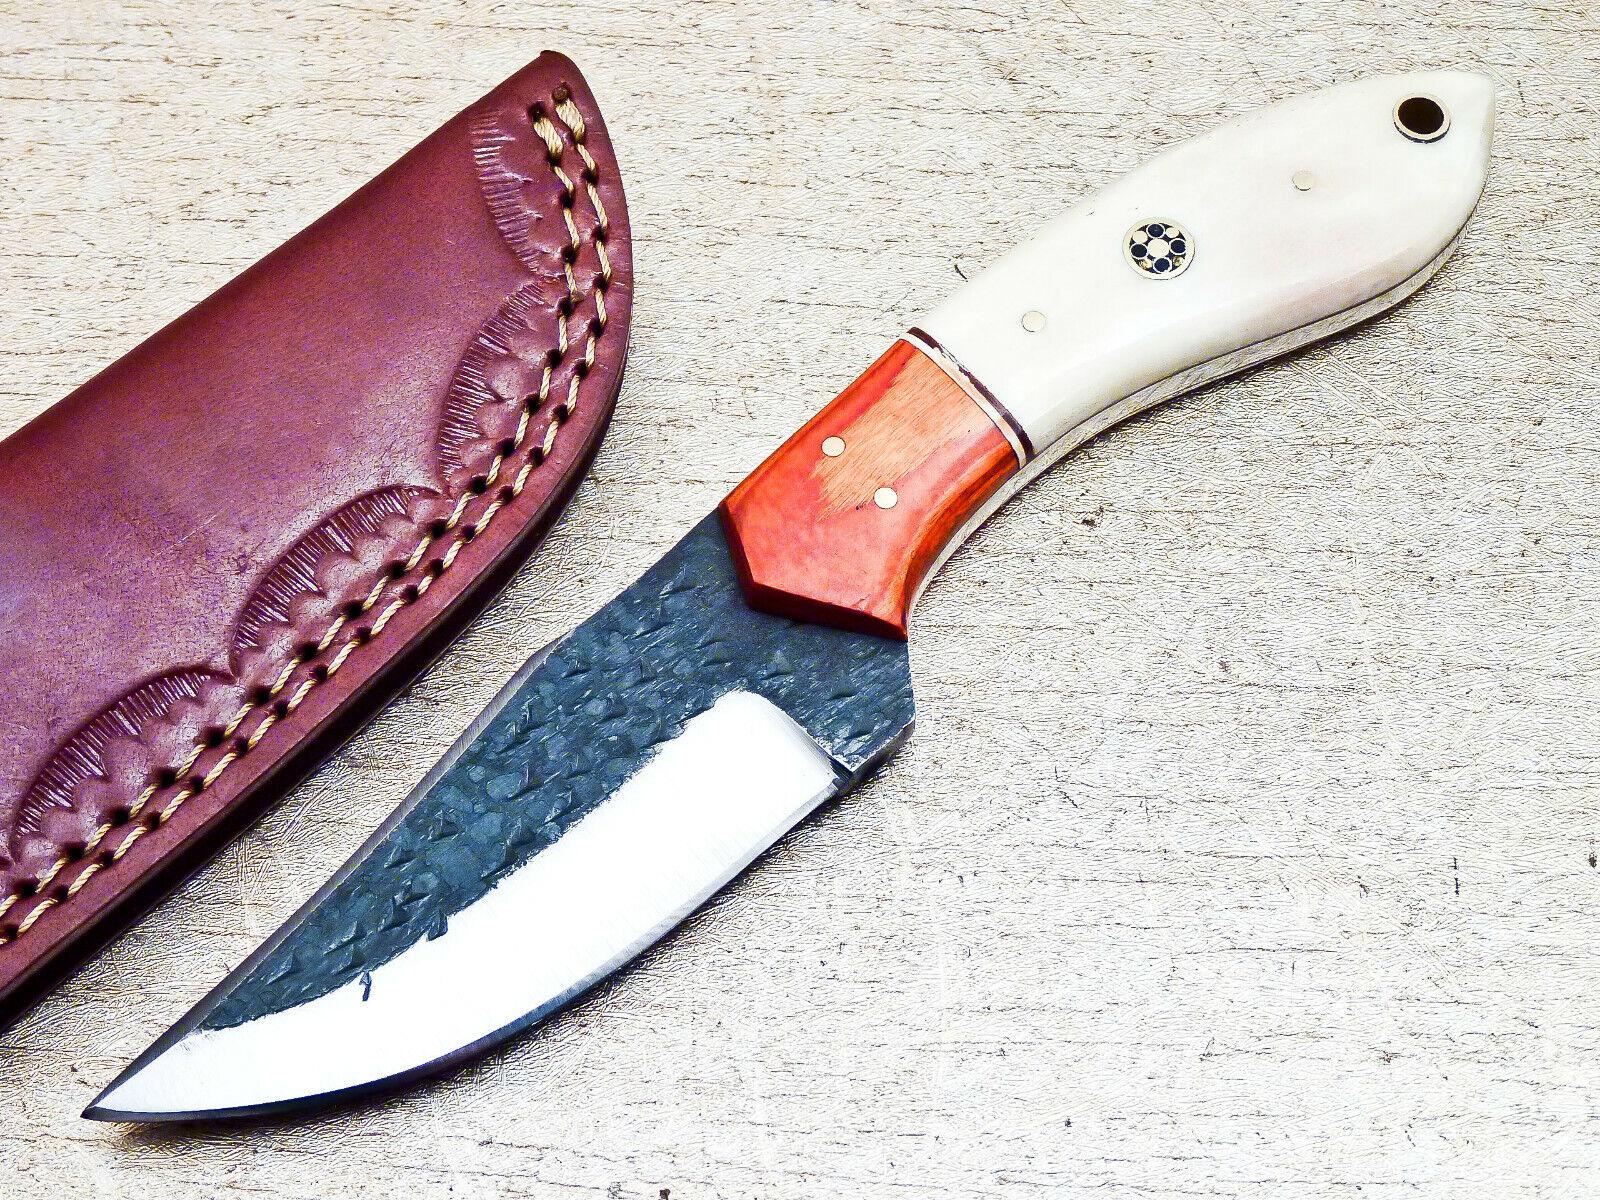 Elegant Custom Hand Forged Railroad Spike Carbon Steel Fixed Blade Knife UT-7997 - $13.00